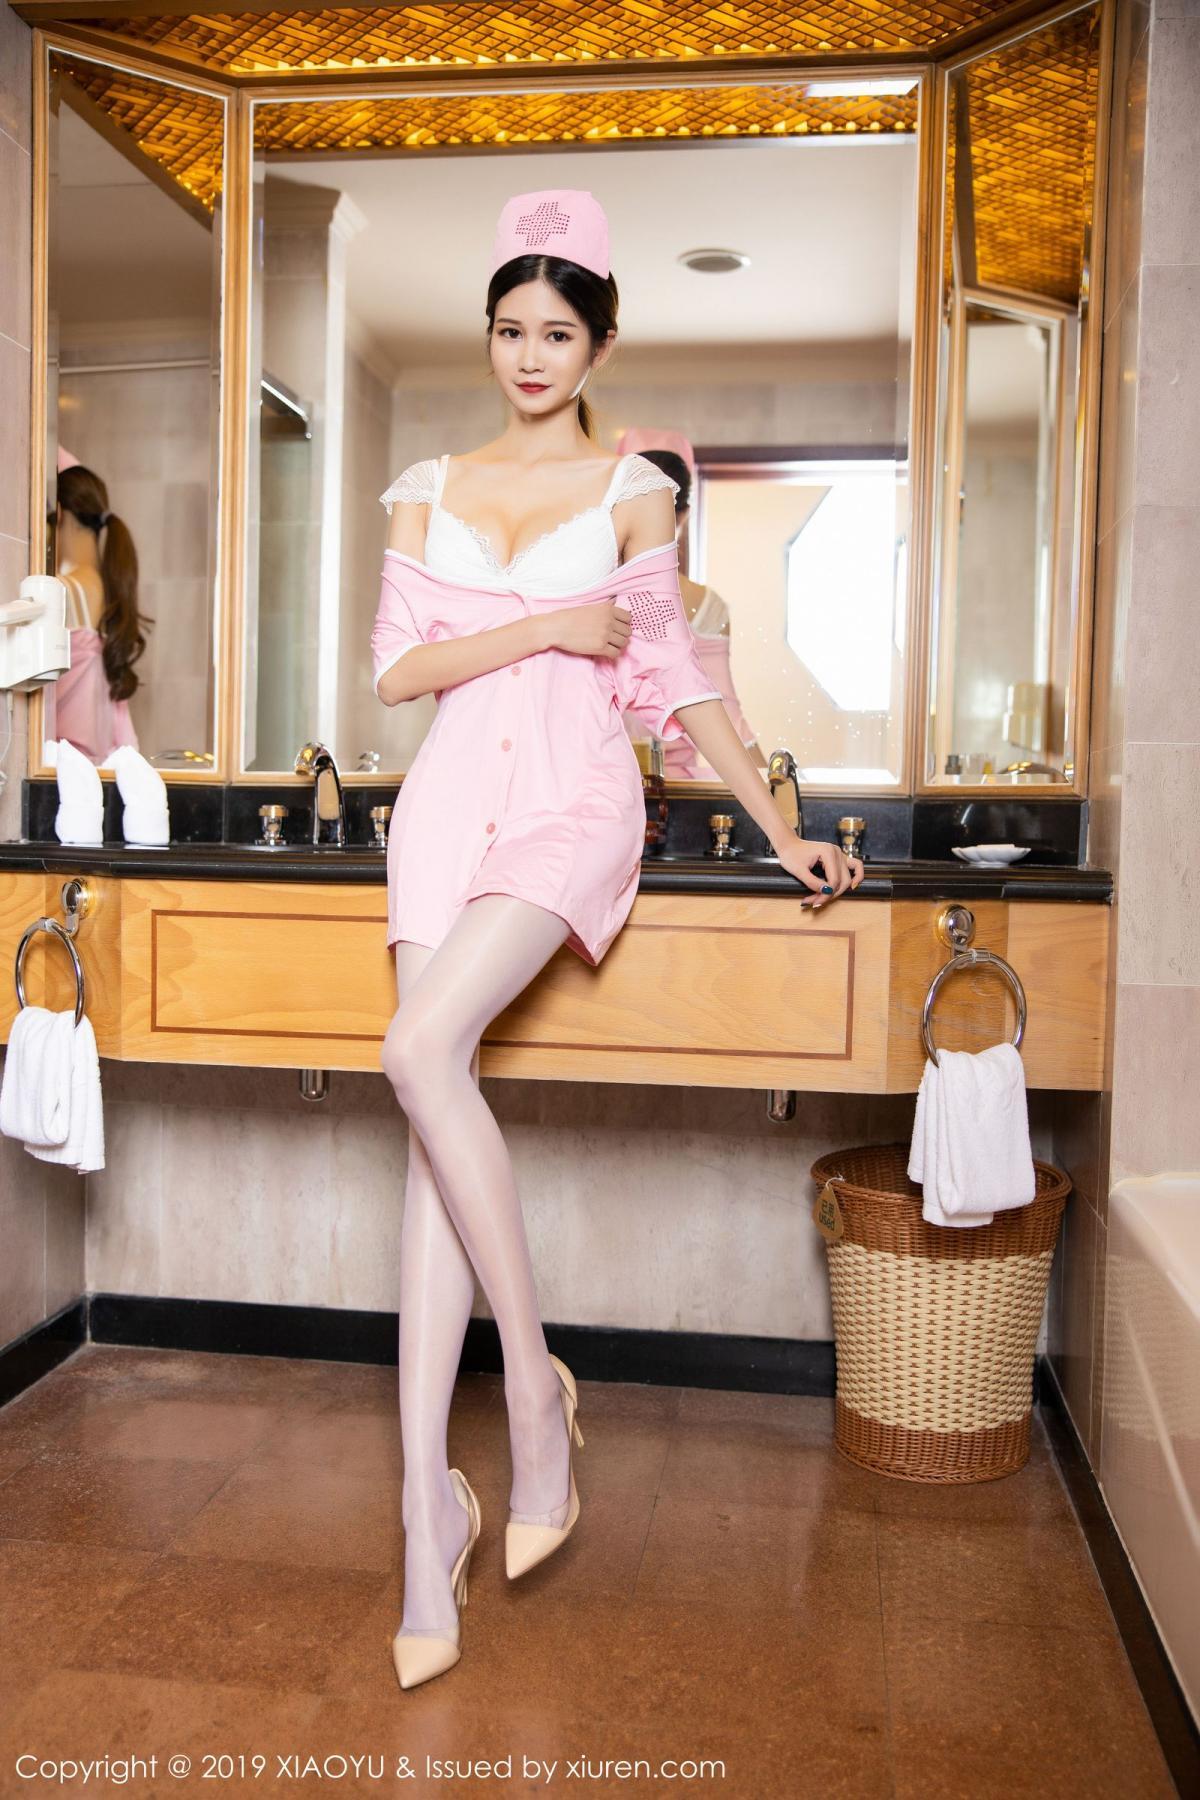 [XiaoYu] Vol.218 Cheng Cheng Cheng 10P, Cheng Cheng Cheng, Nurse, Tall, XiaoYu